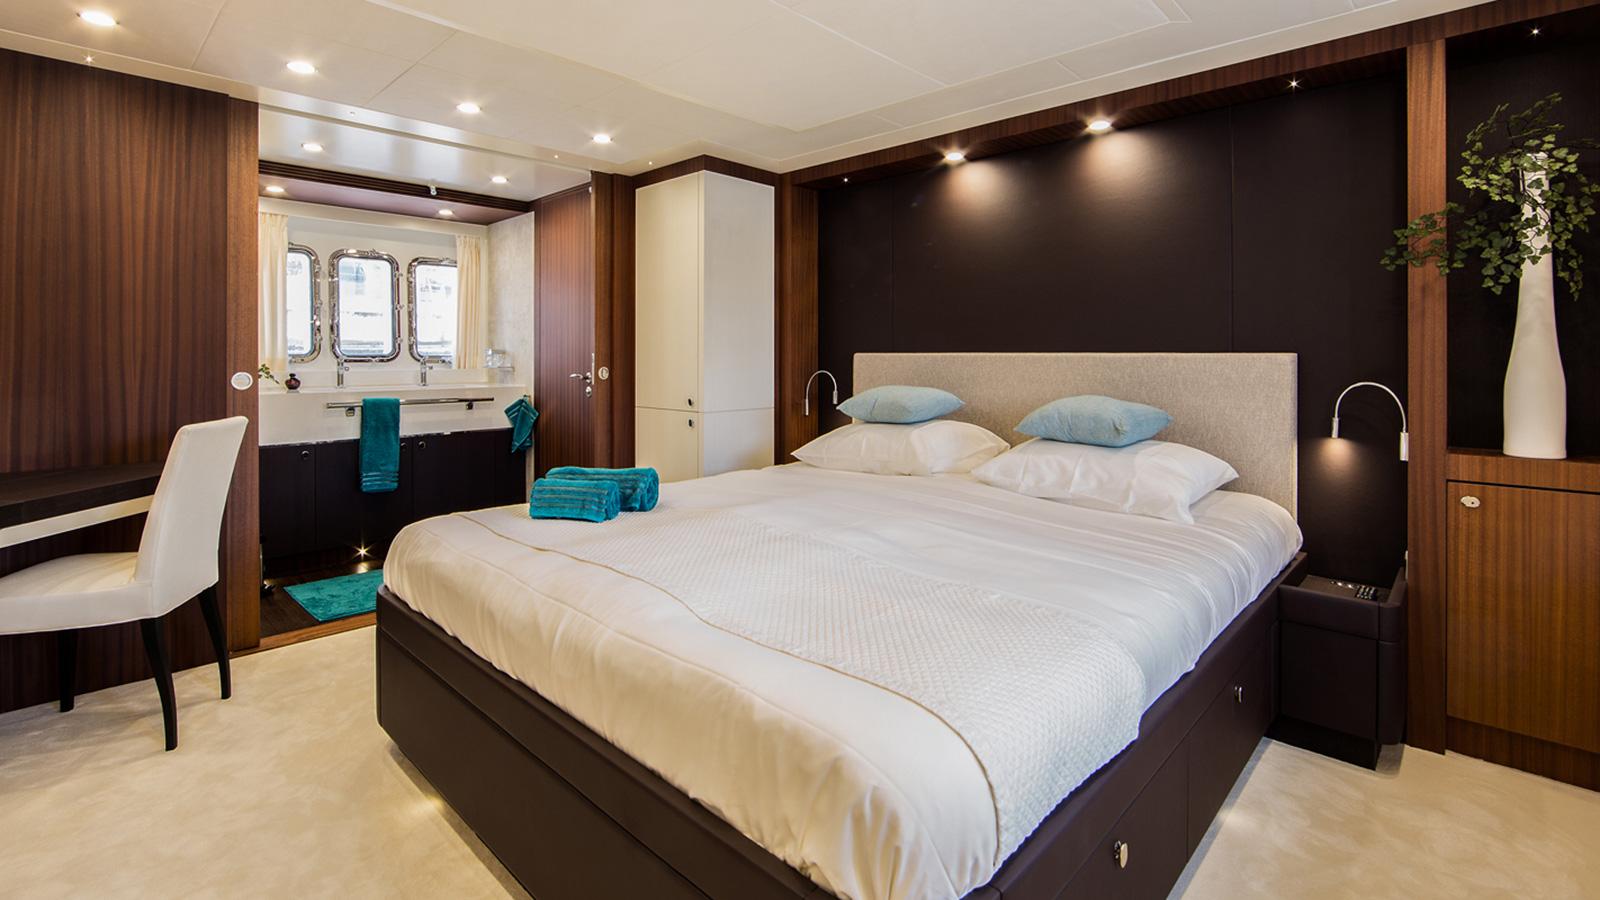 the-master-stateroom-of-the-van-der-valk-explorer-yacht-dutch-falcon